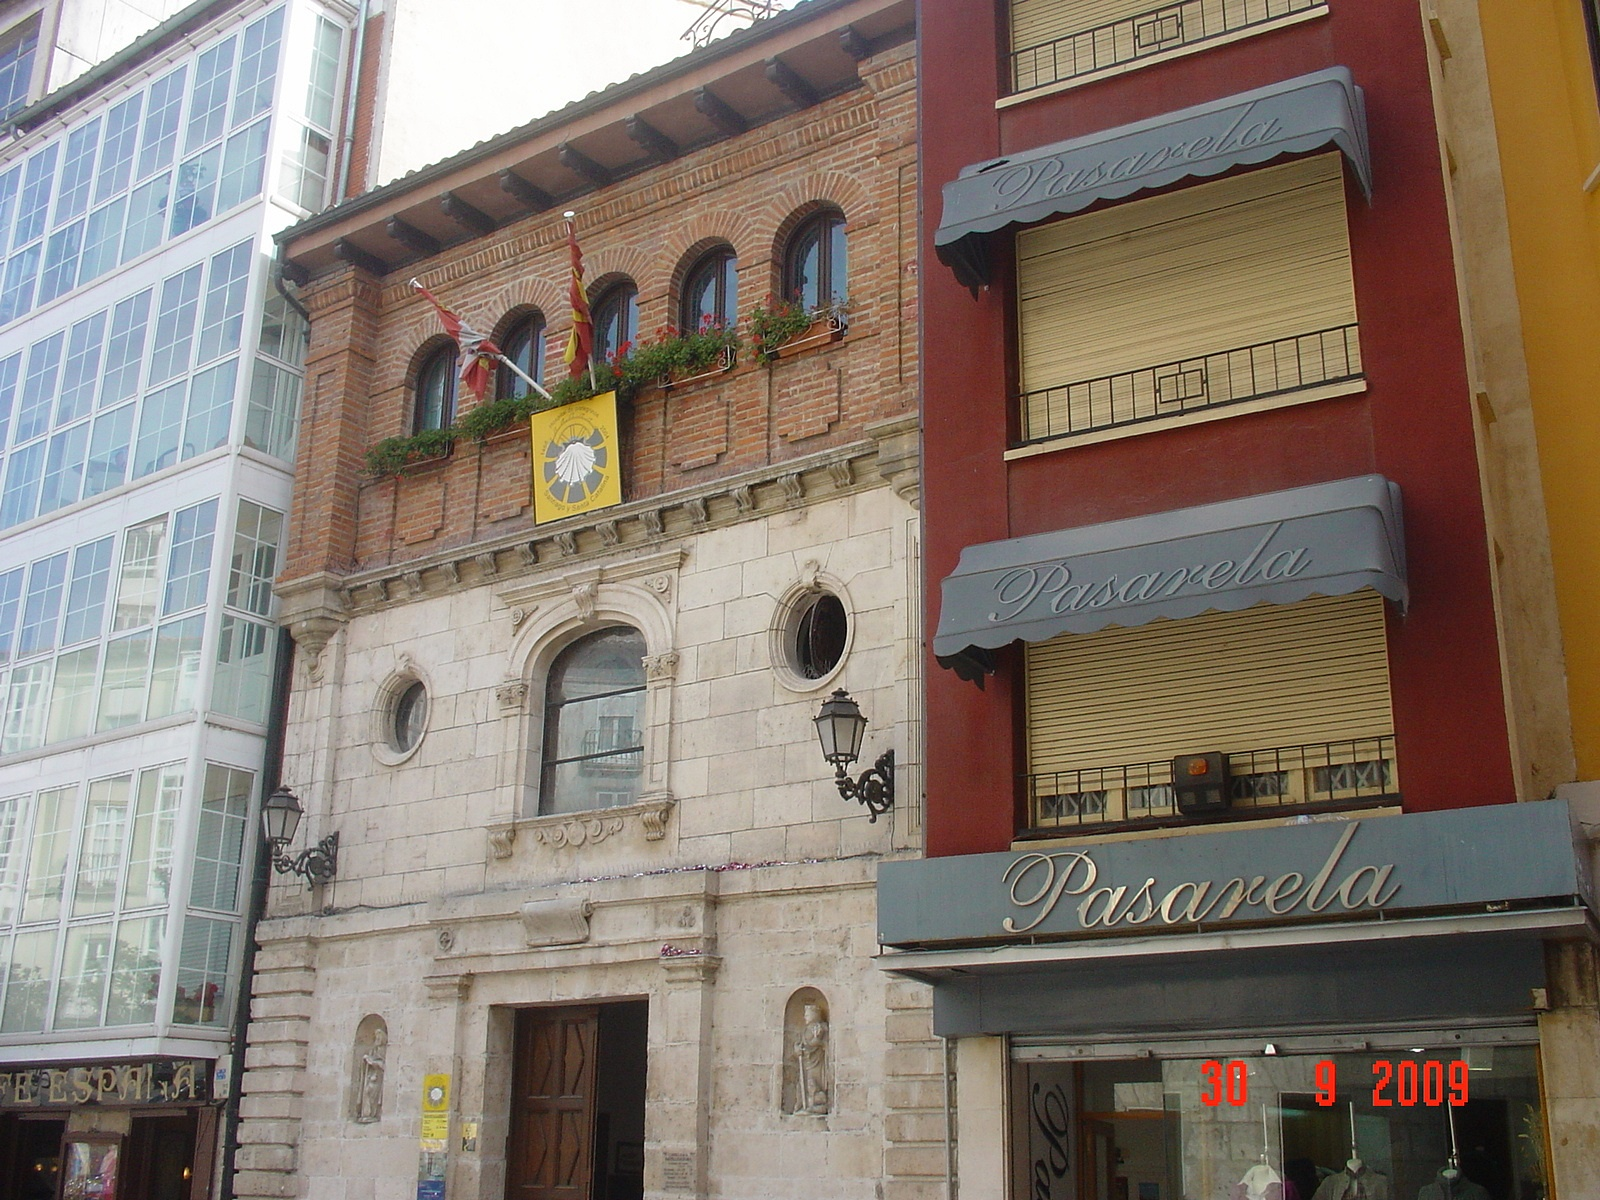 Ankunft in Burgos Albergo in der Innenstadt